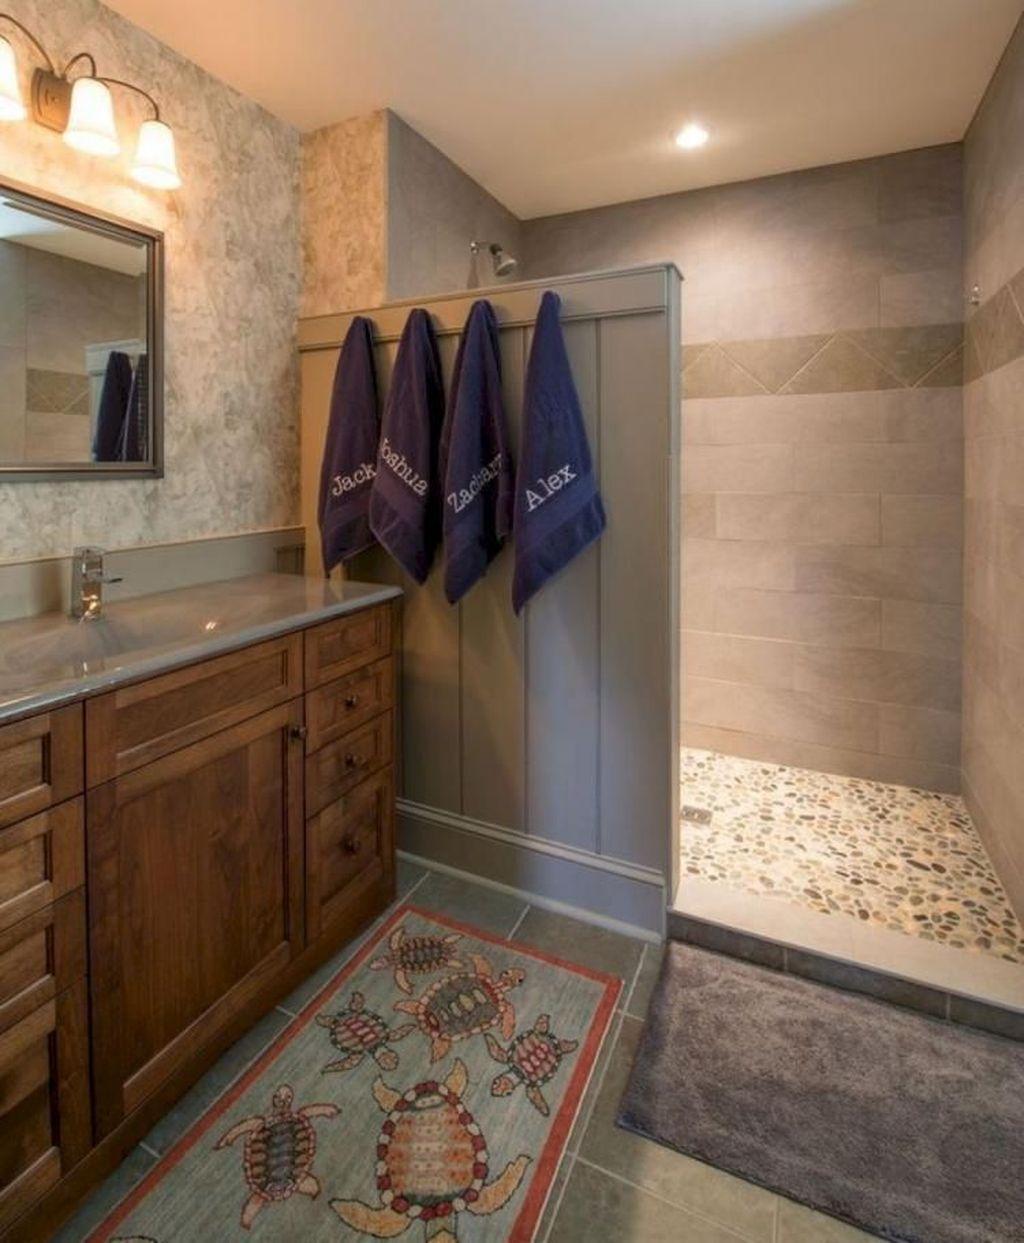 Astonishing Farmhouse Shower Tile Decor Ideas To Try 29